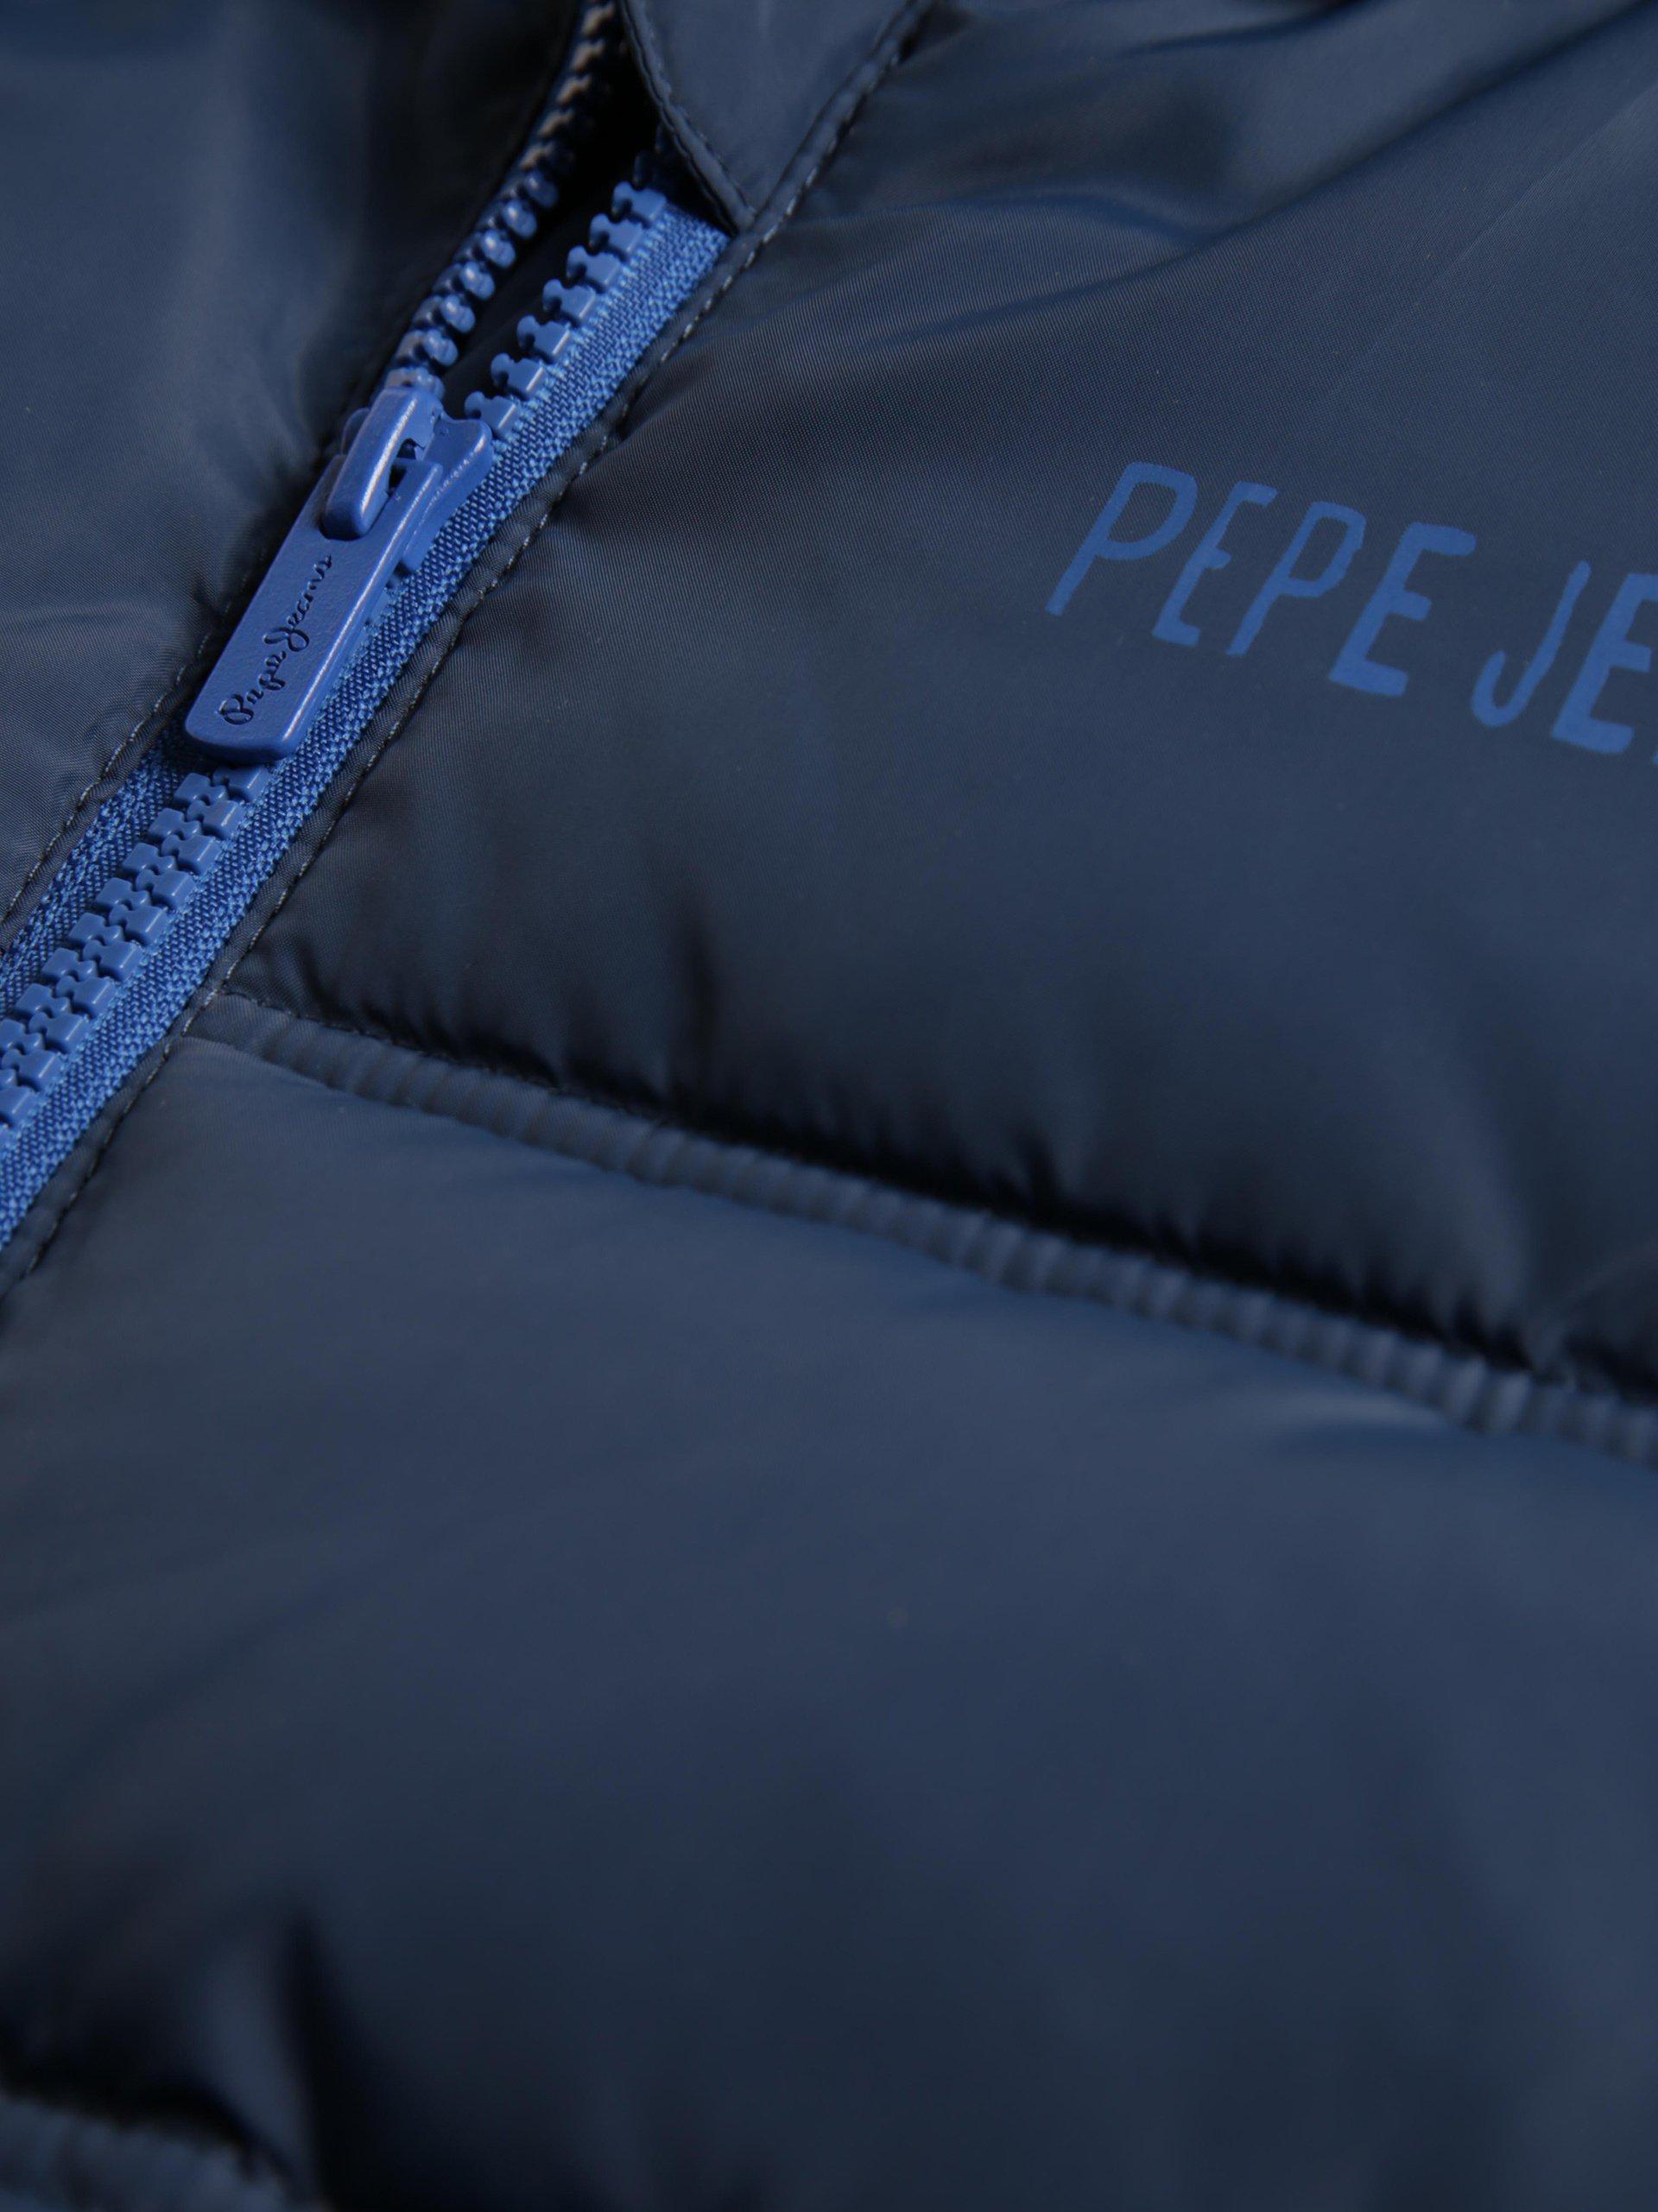 Pepe Jeans Jungen Steppjacke - Mark